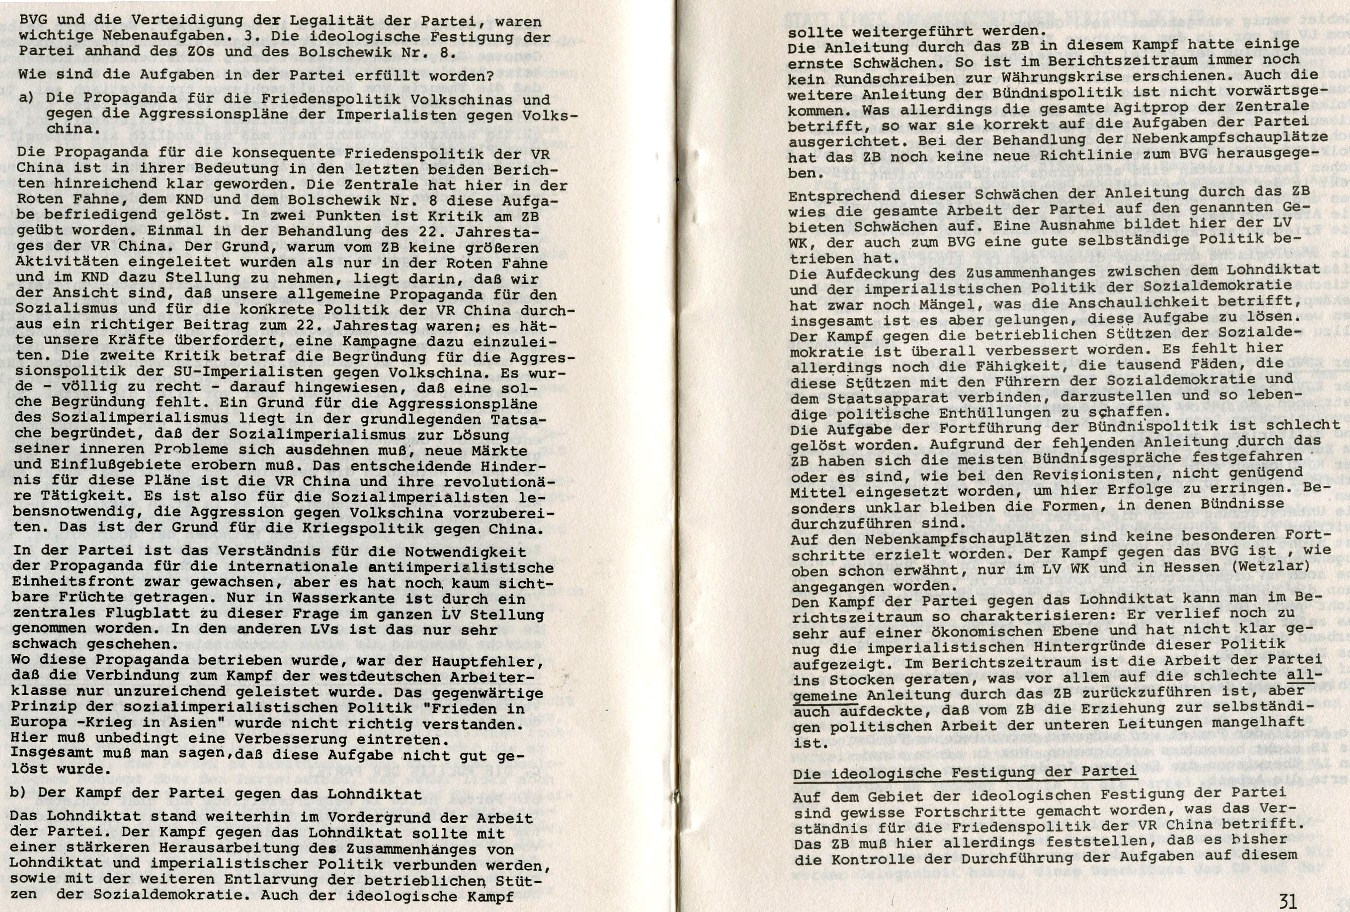 ZB_Parteiarbeiter_1971_09_16